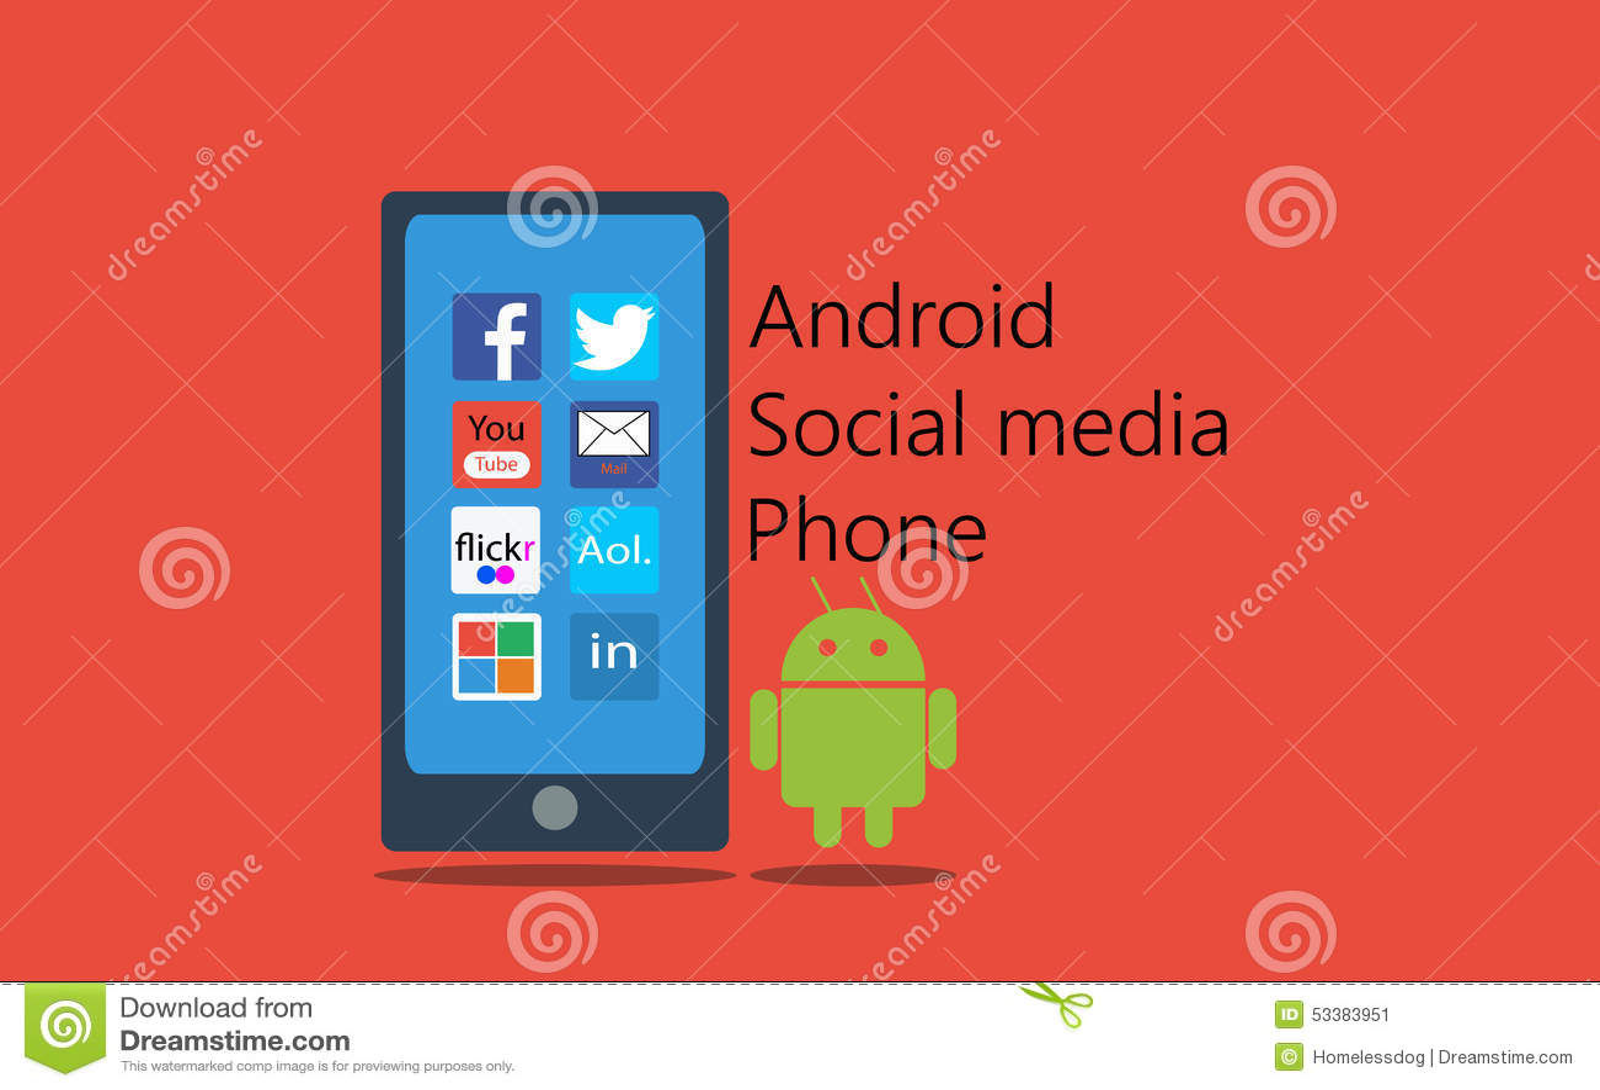 Android social media phone